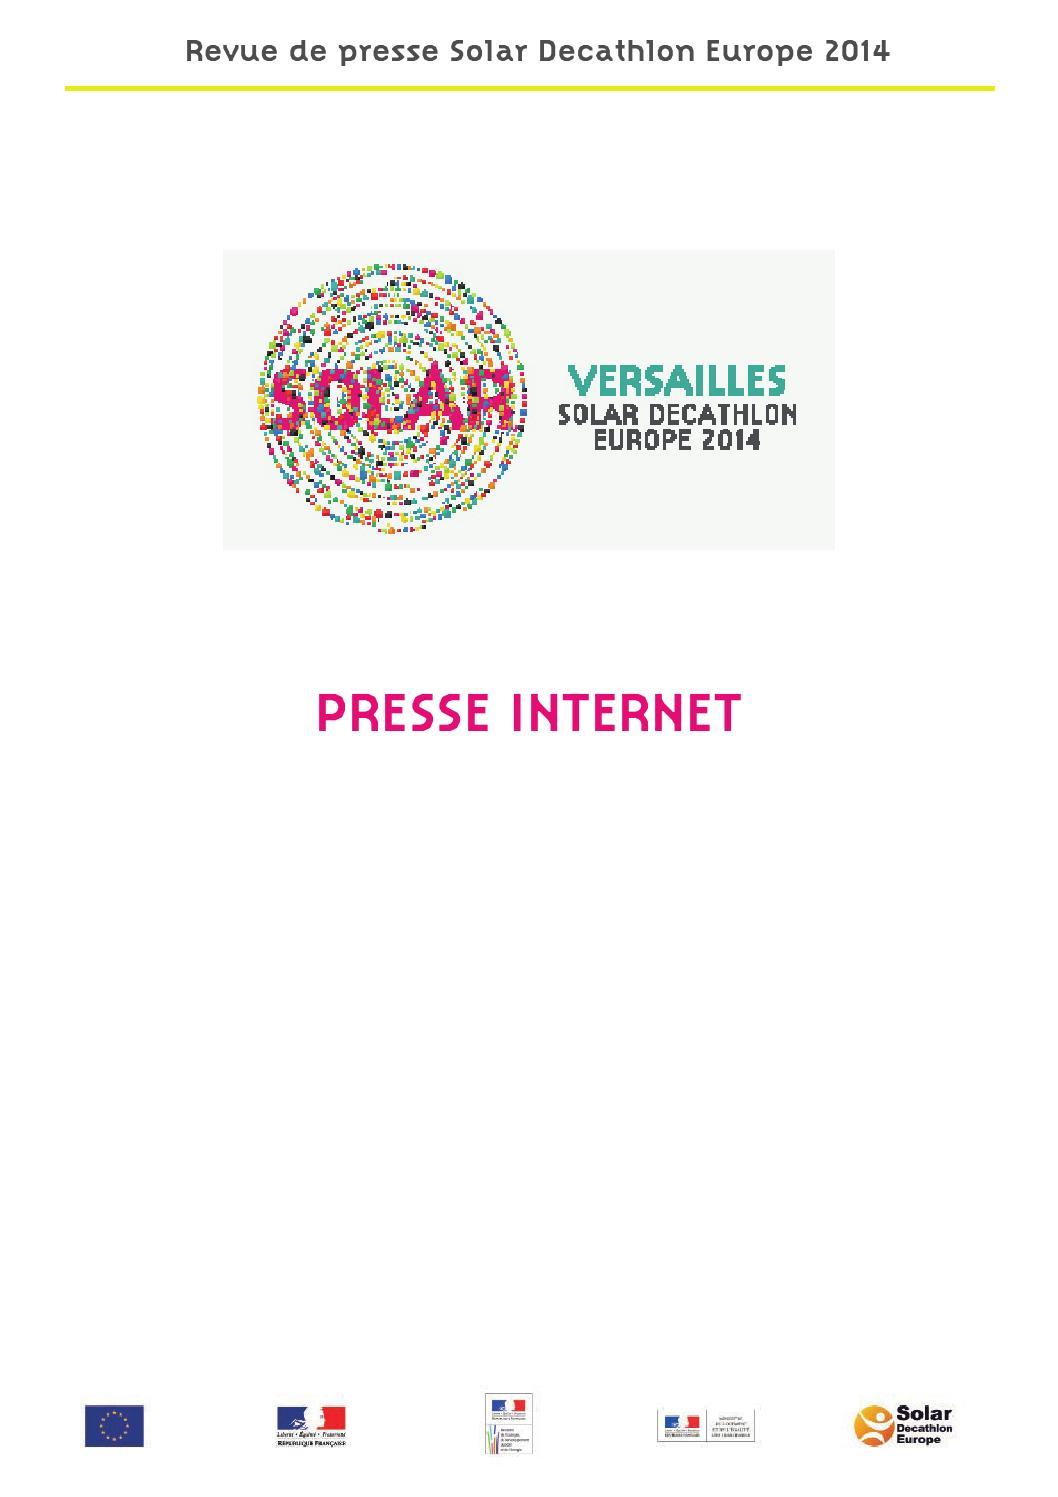 Revue de presse sde2014 presse internet by SD Europe - issuu 8e8f1abbf79